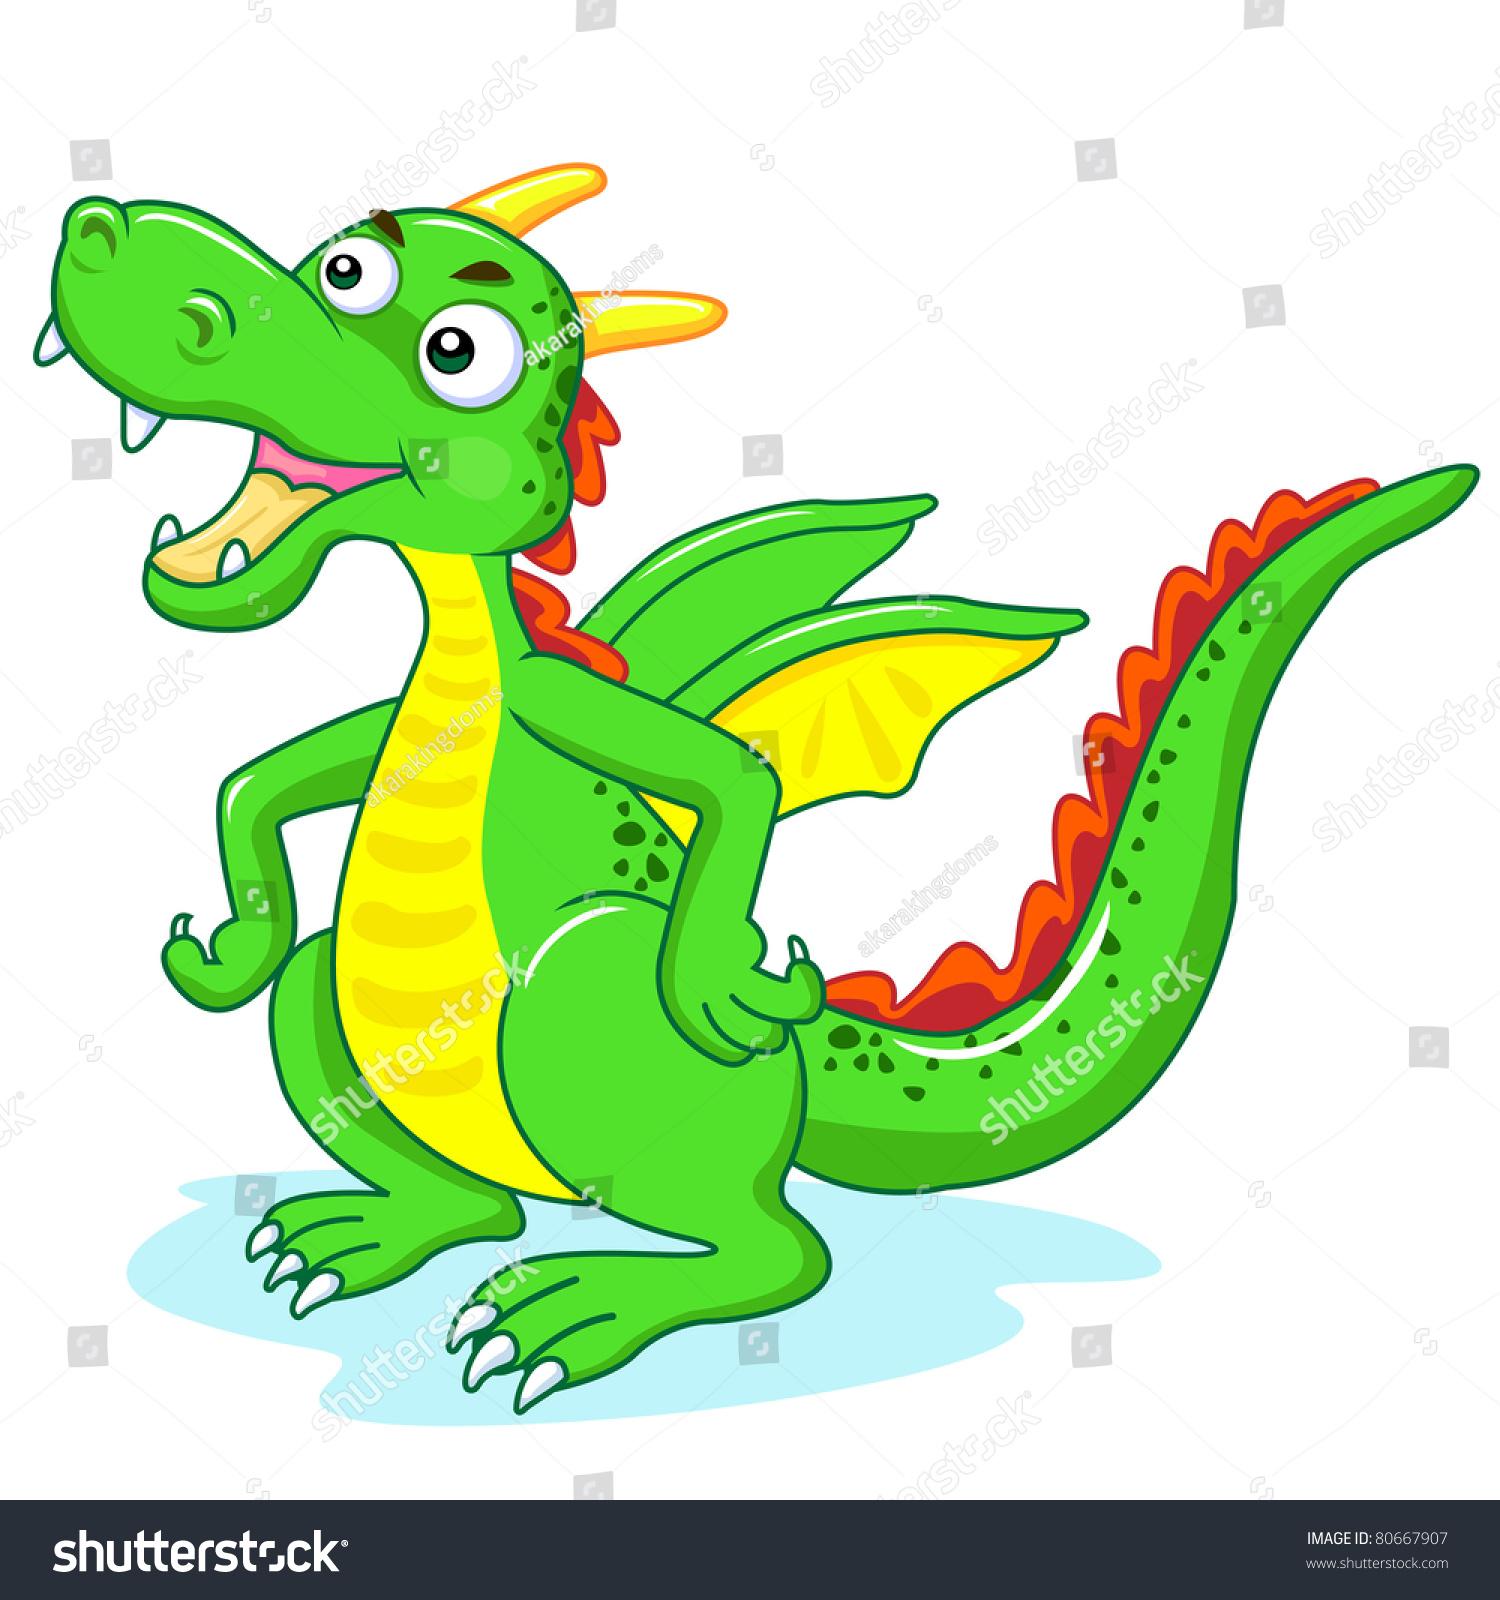 The Dragon Cartoon For Kids Stock Vector Illustration 80667907 ...